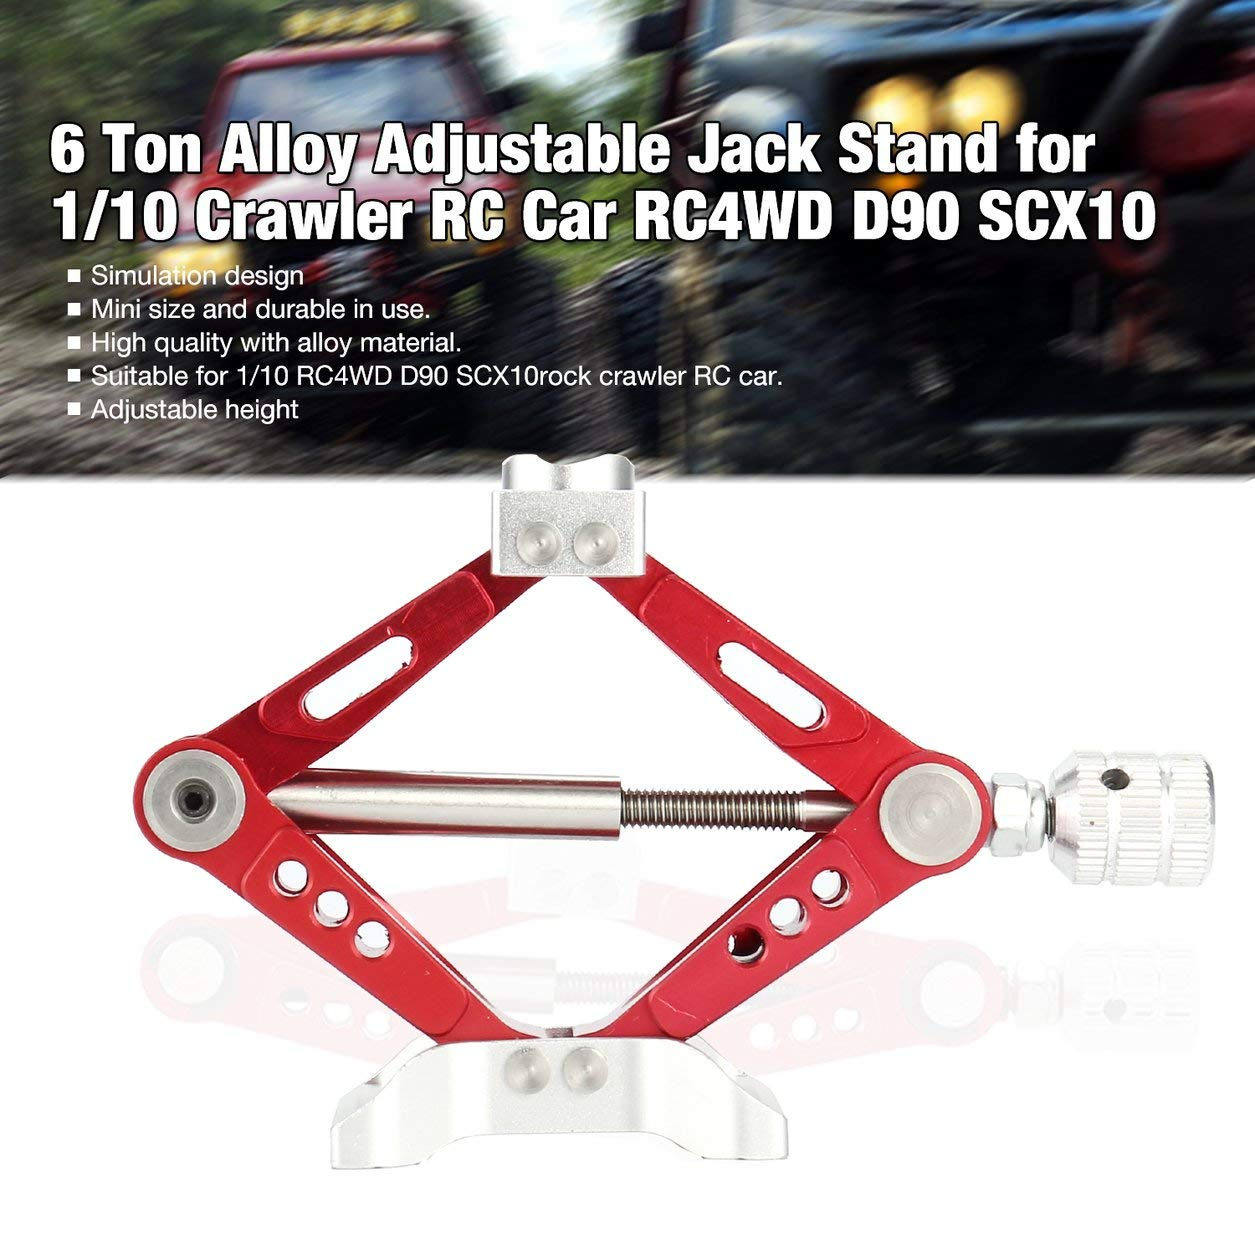 Dailyinshop 6 Tonne Aluminiumlegierung Metall Einstellbare Jack Stand Reparatur Rack für 1/10 Skala Offroad Crawler RC Auto RC4WD D90 SCX10 (Farbe: Rot)